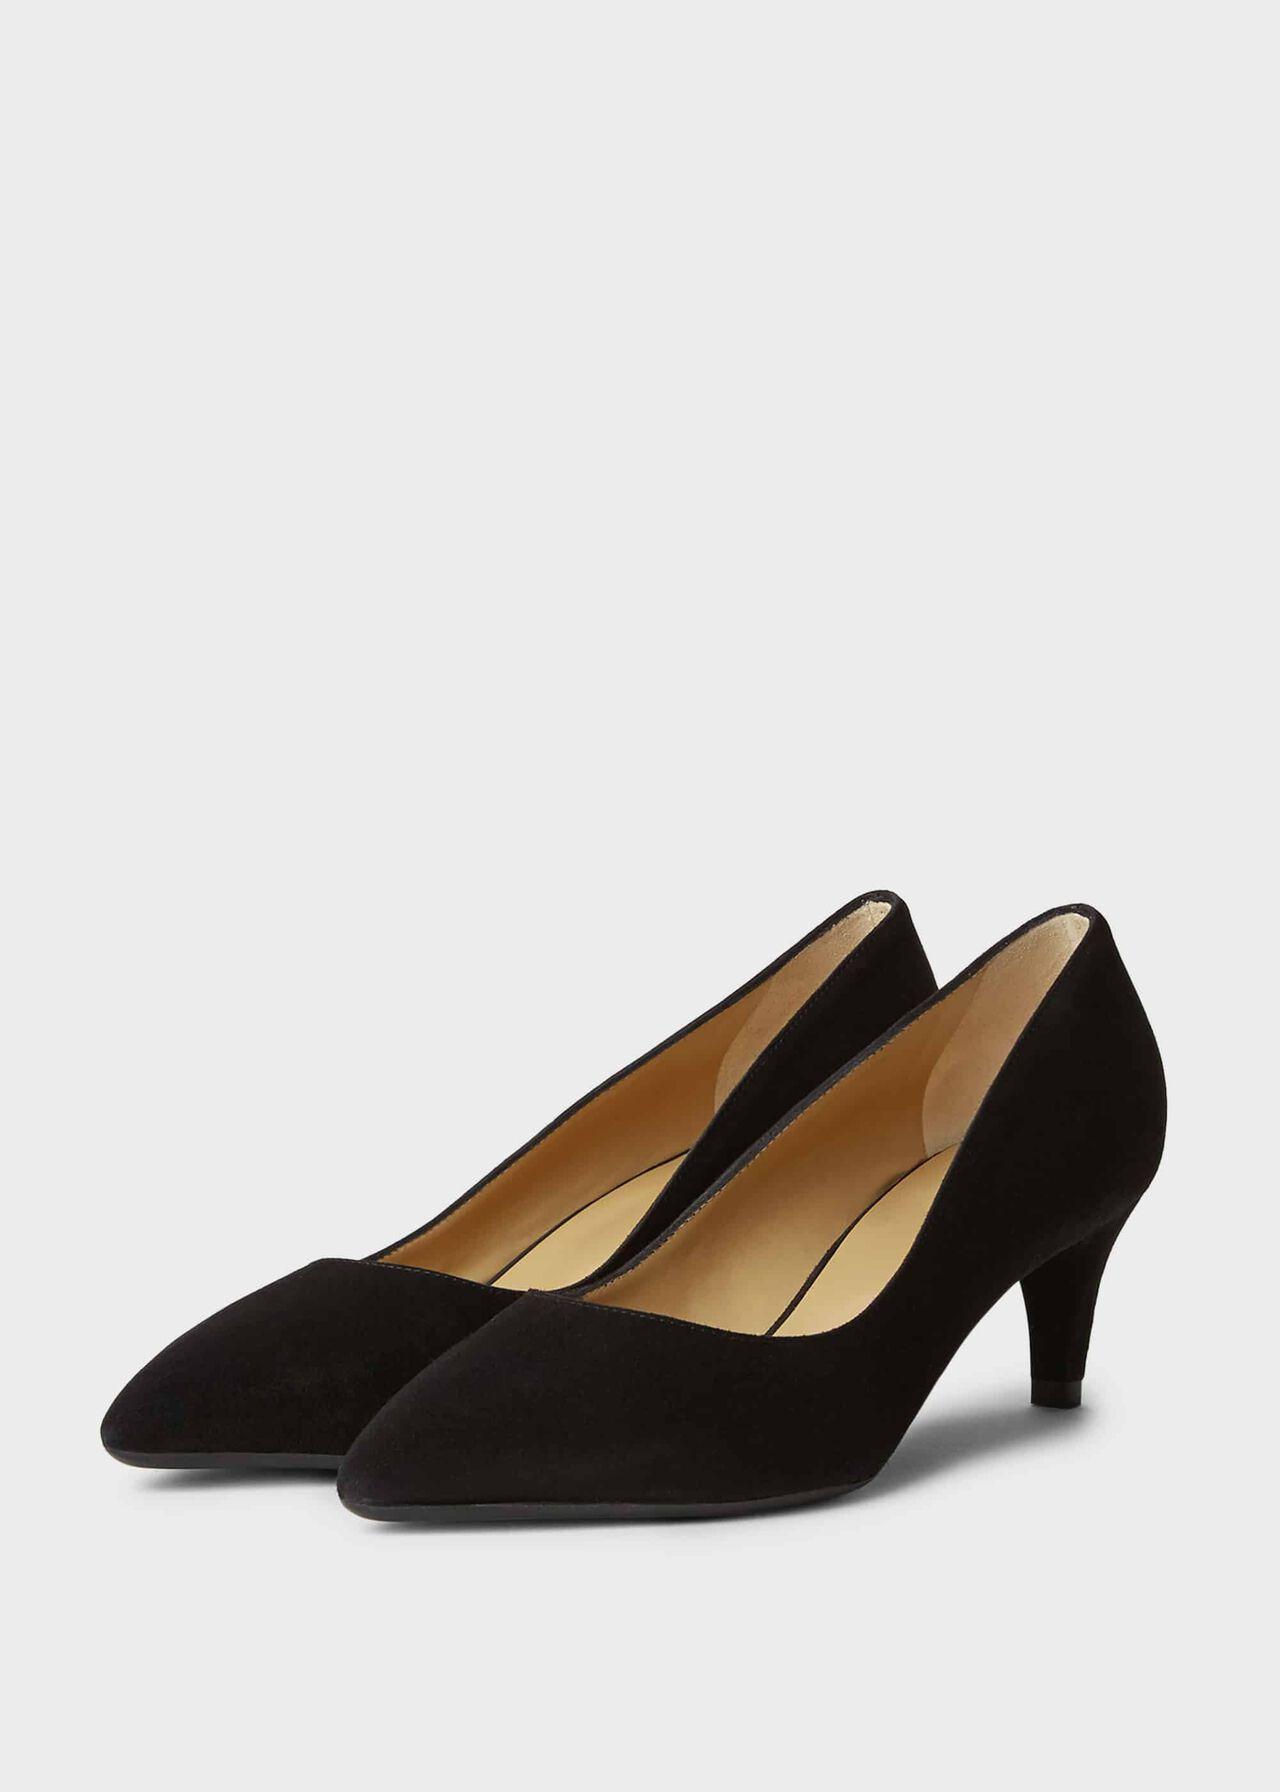 Polly Suede Kitten Heel Court Shoes Black